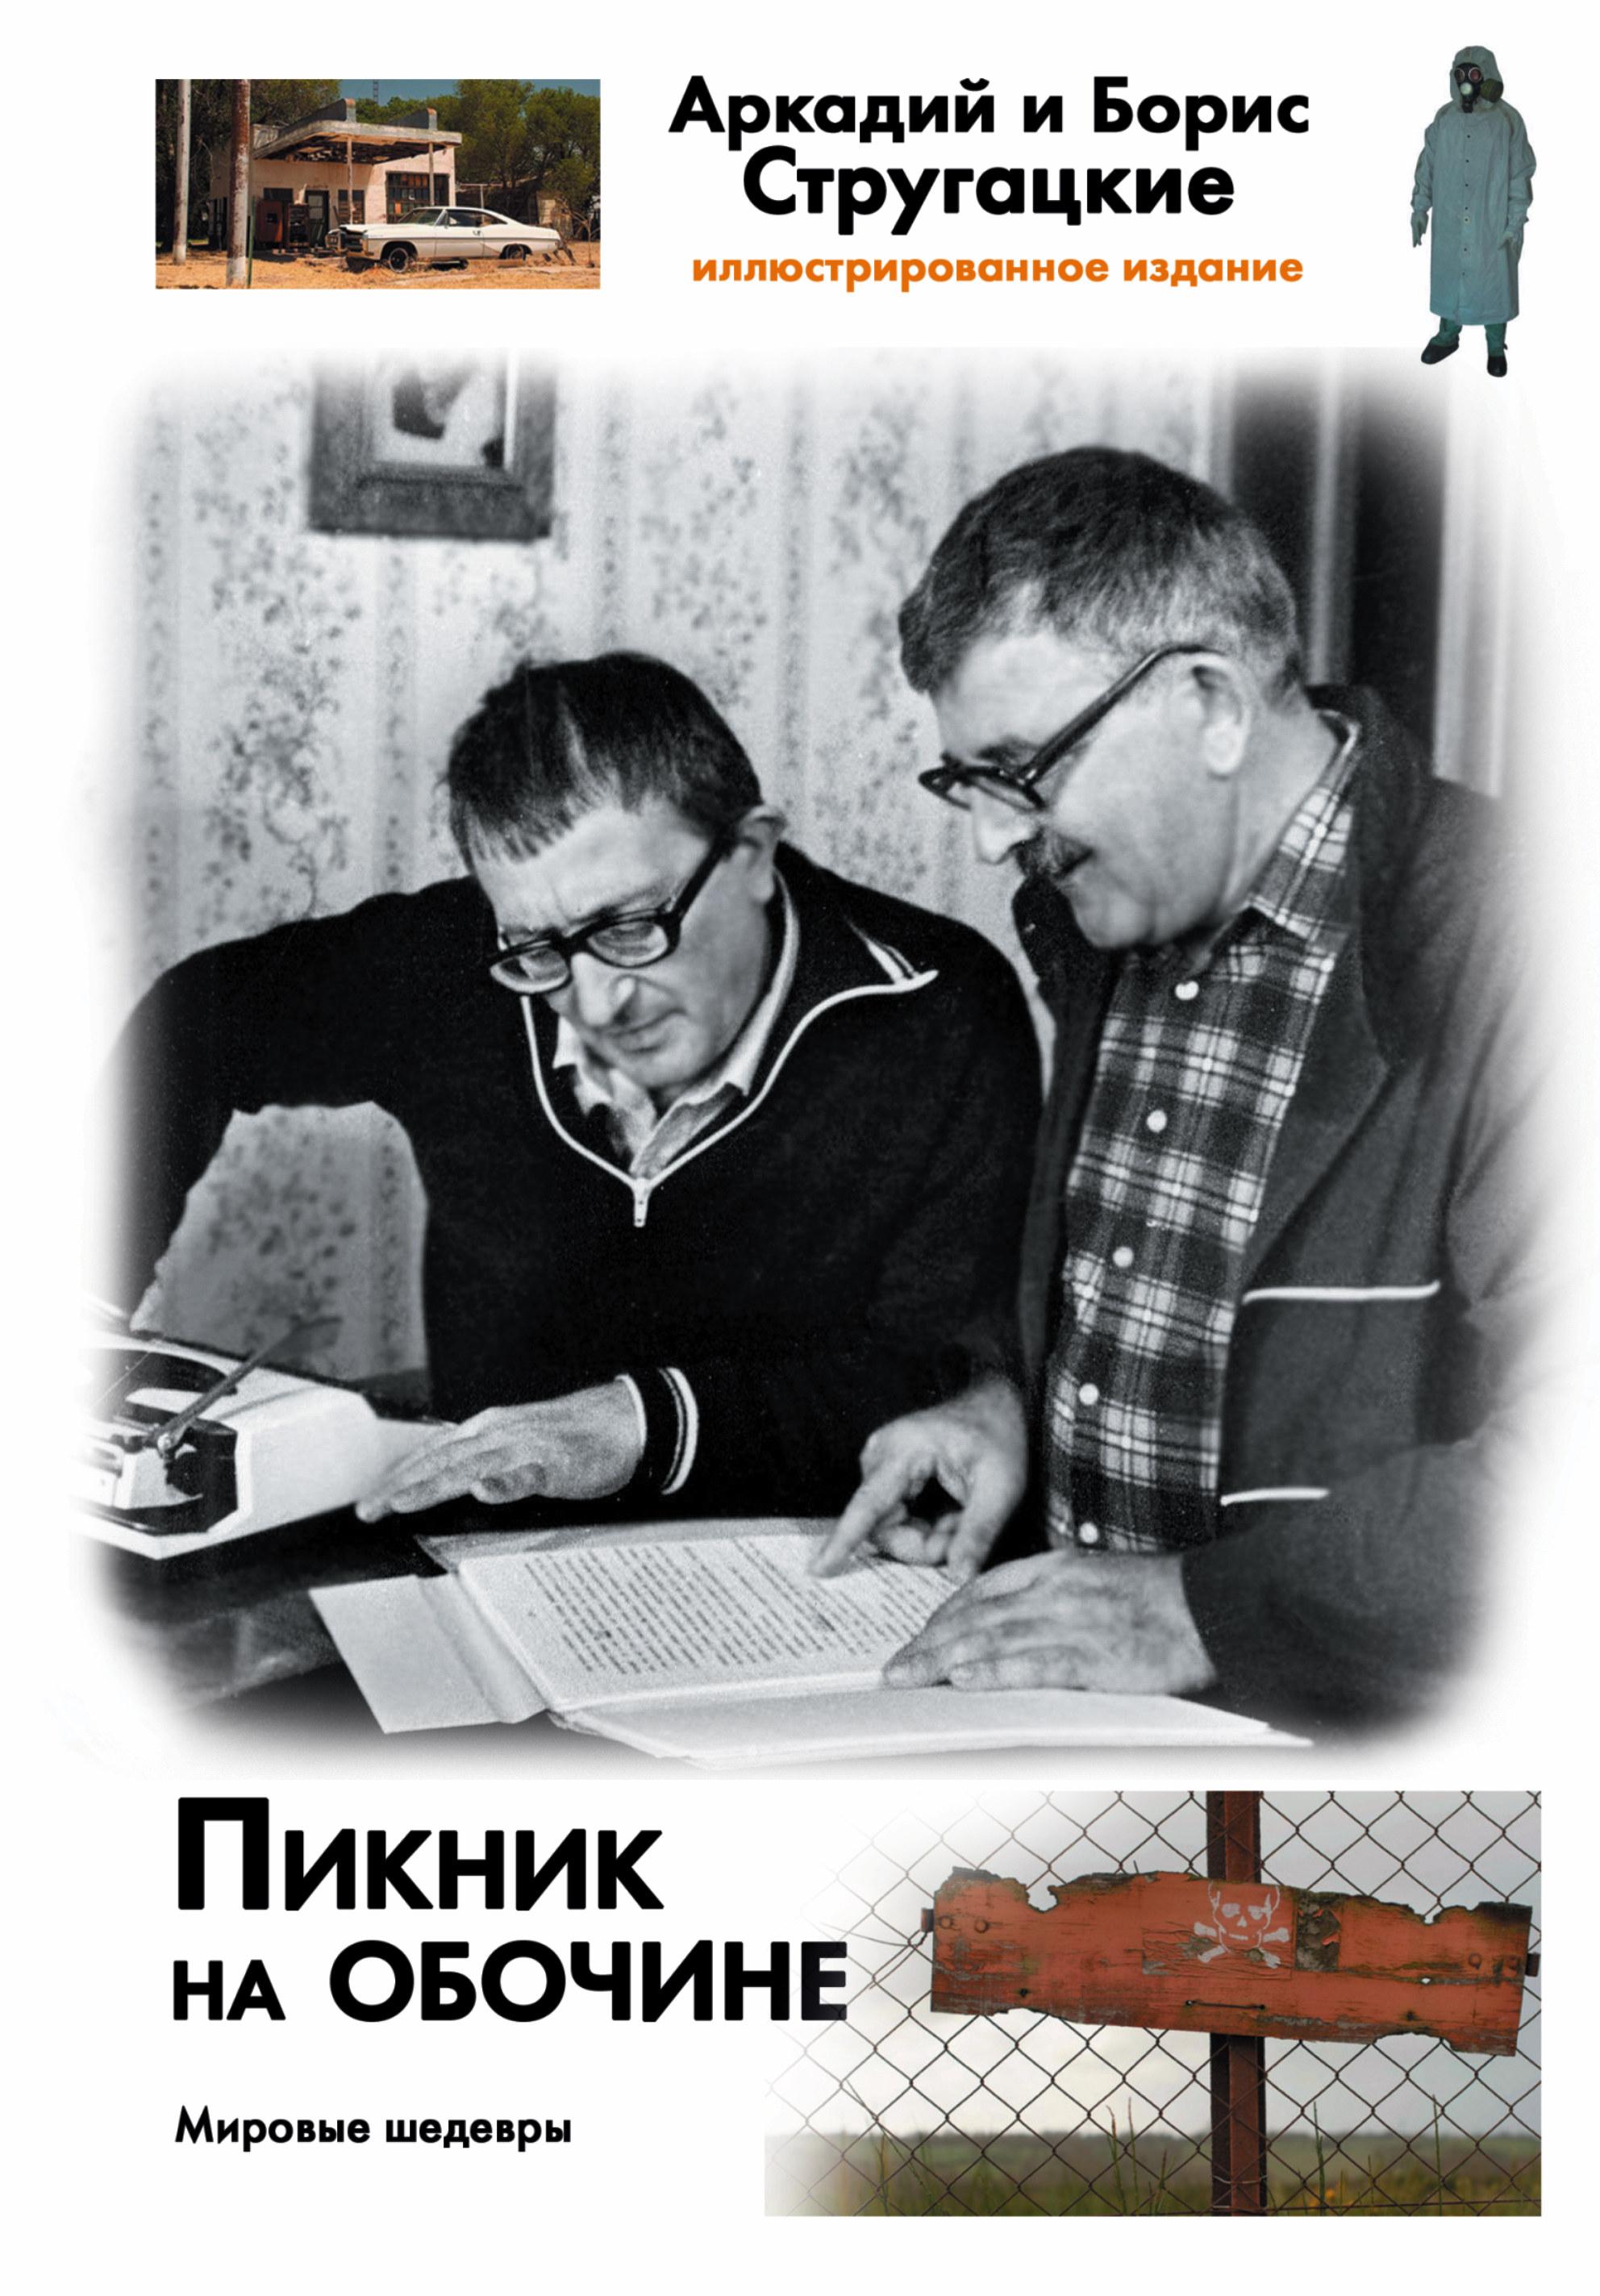 Стругацкий А.Н, Стругацкий Б.Н. Пикник на обочине